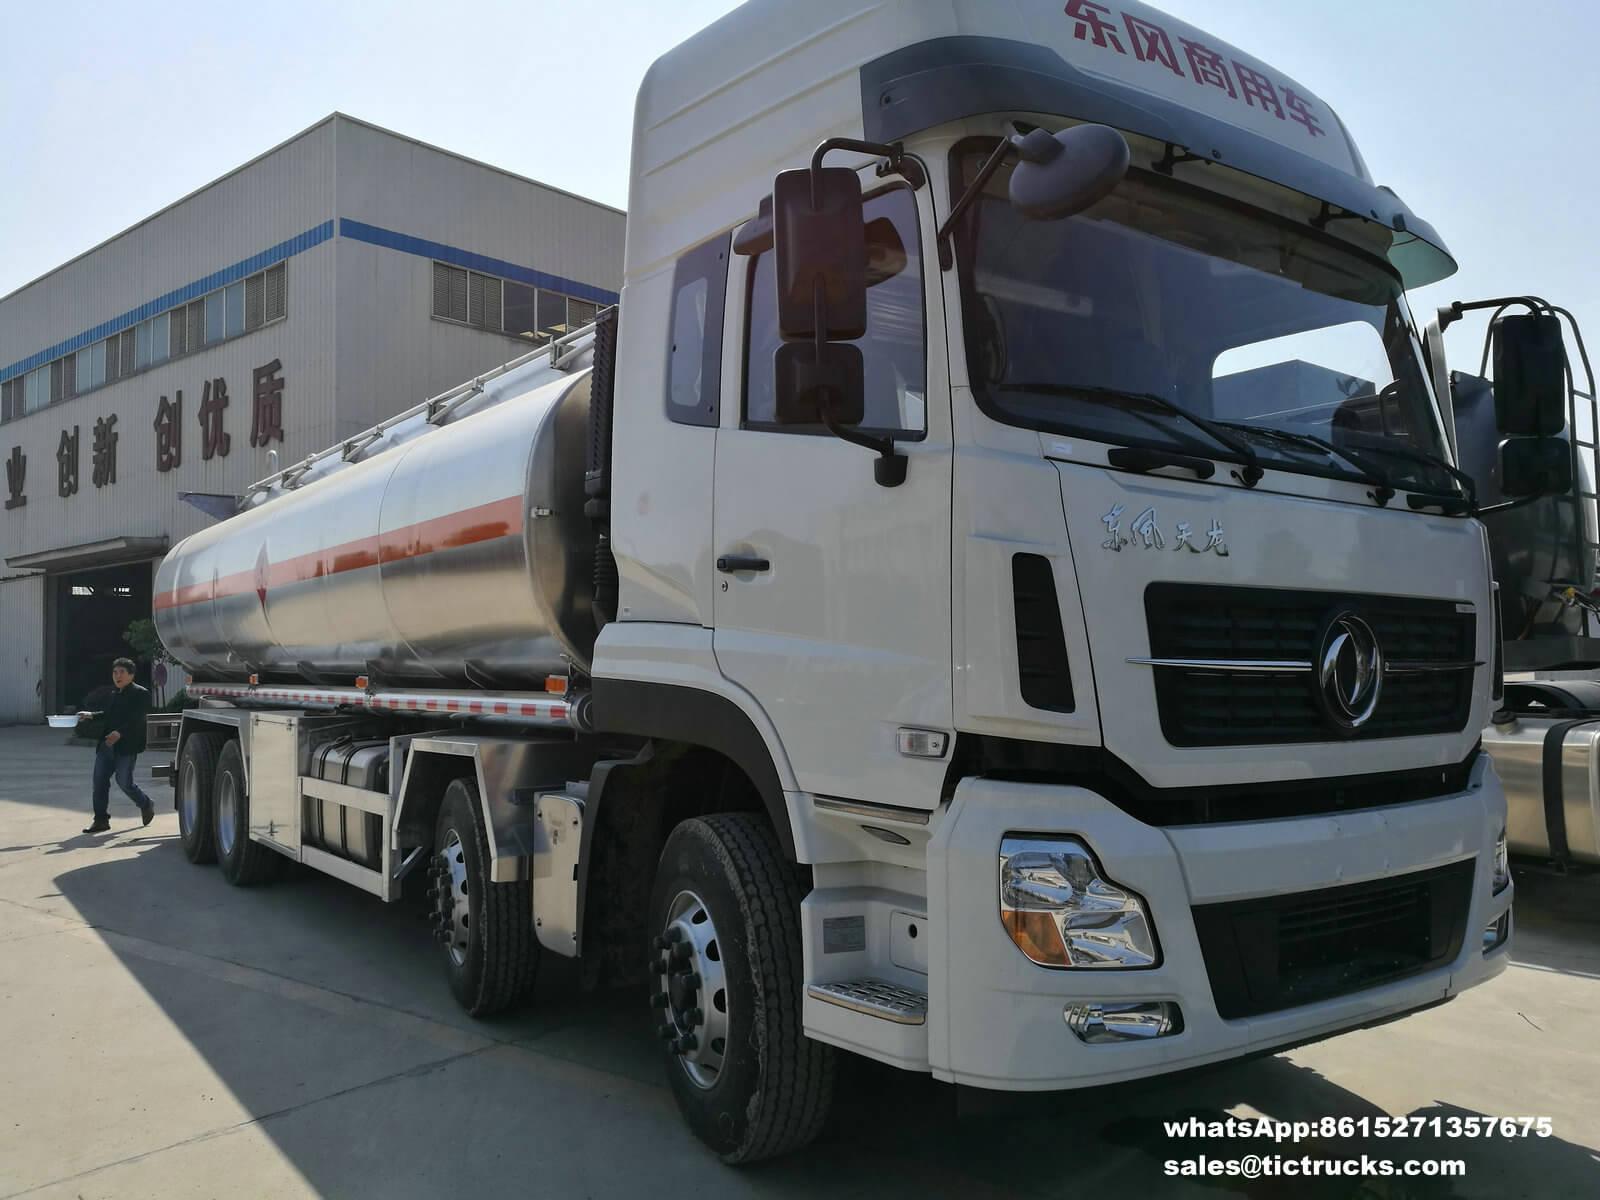 Camion-citerne -29T-dongfeng truck.jpg d'alliage d'aluminium